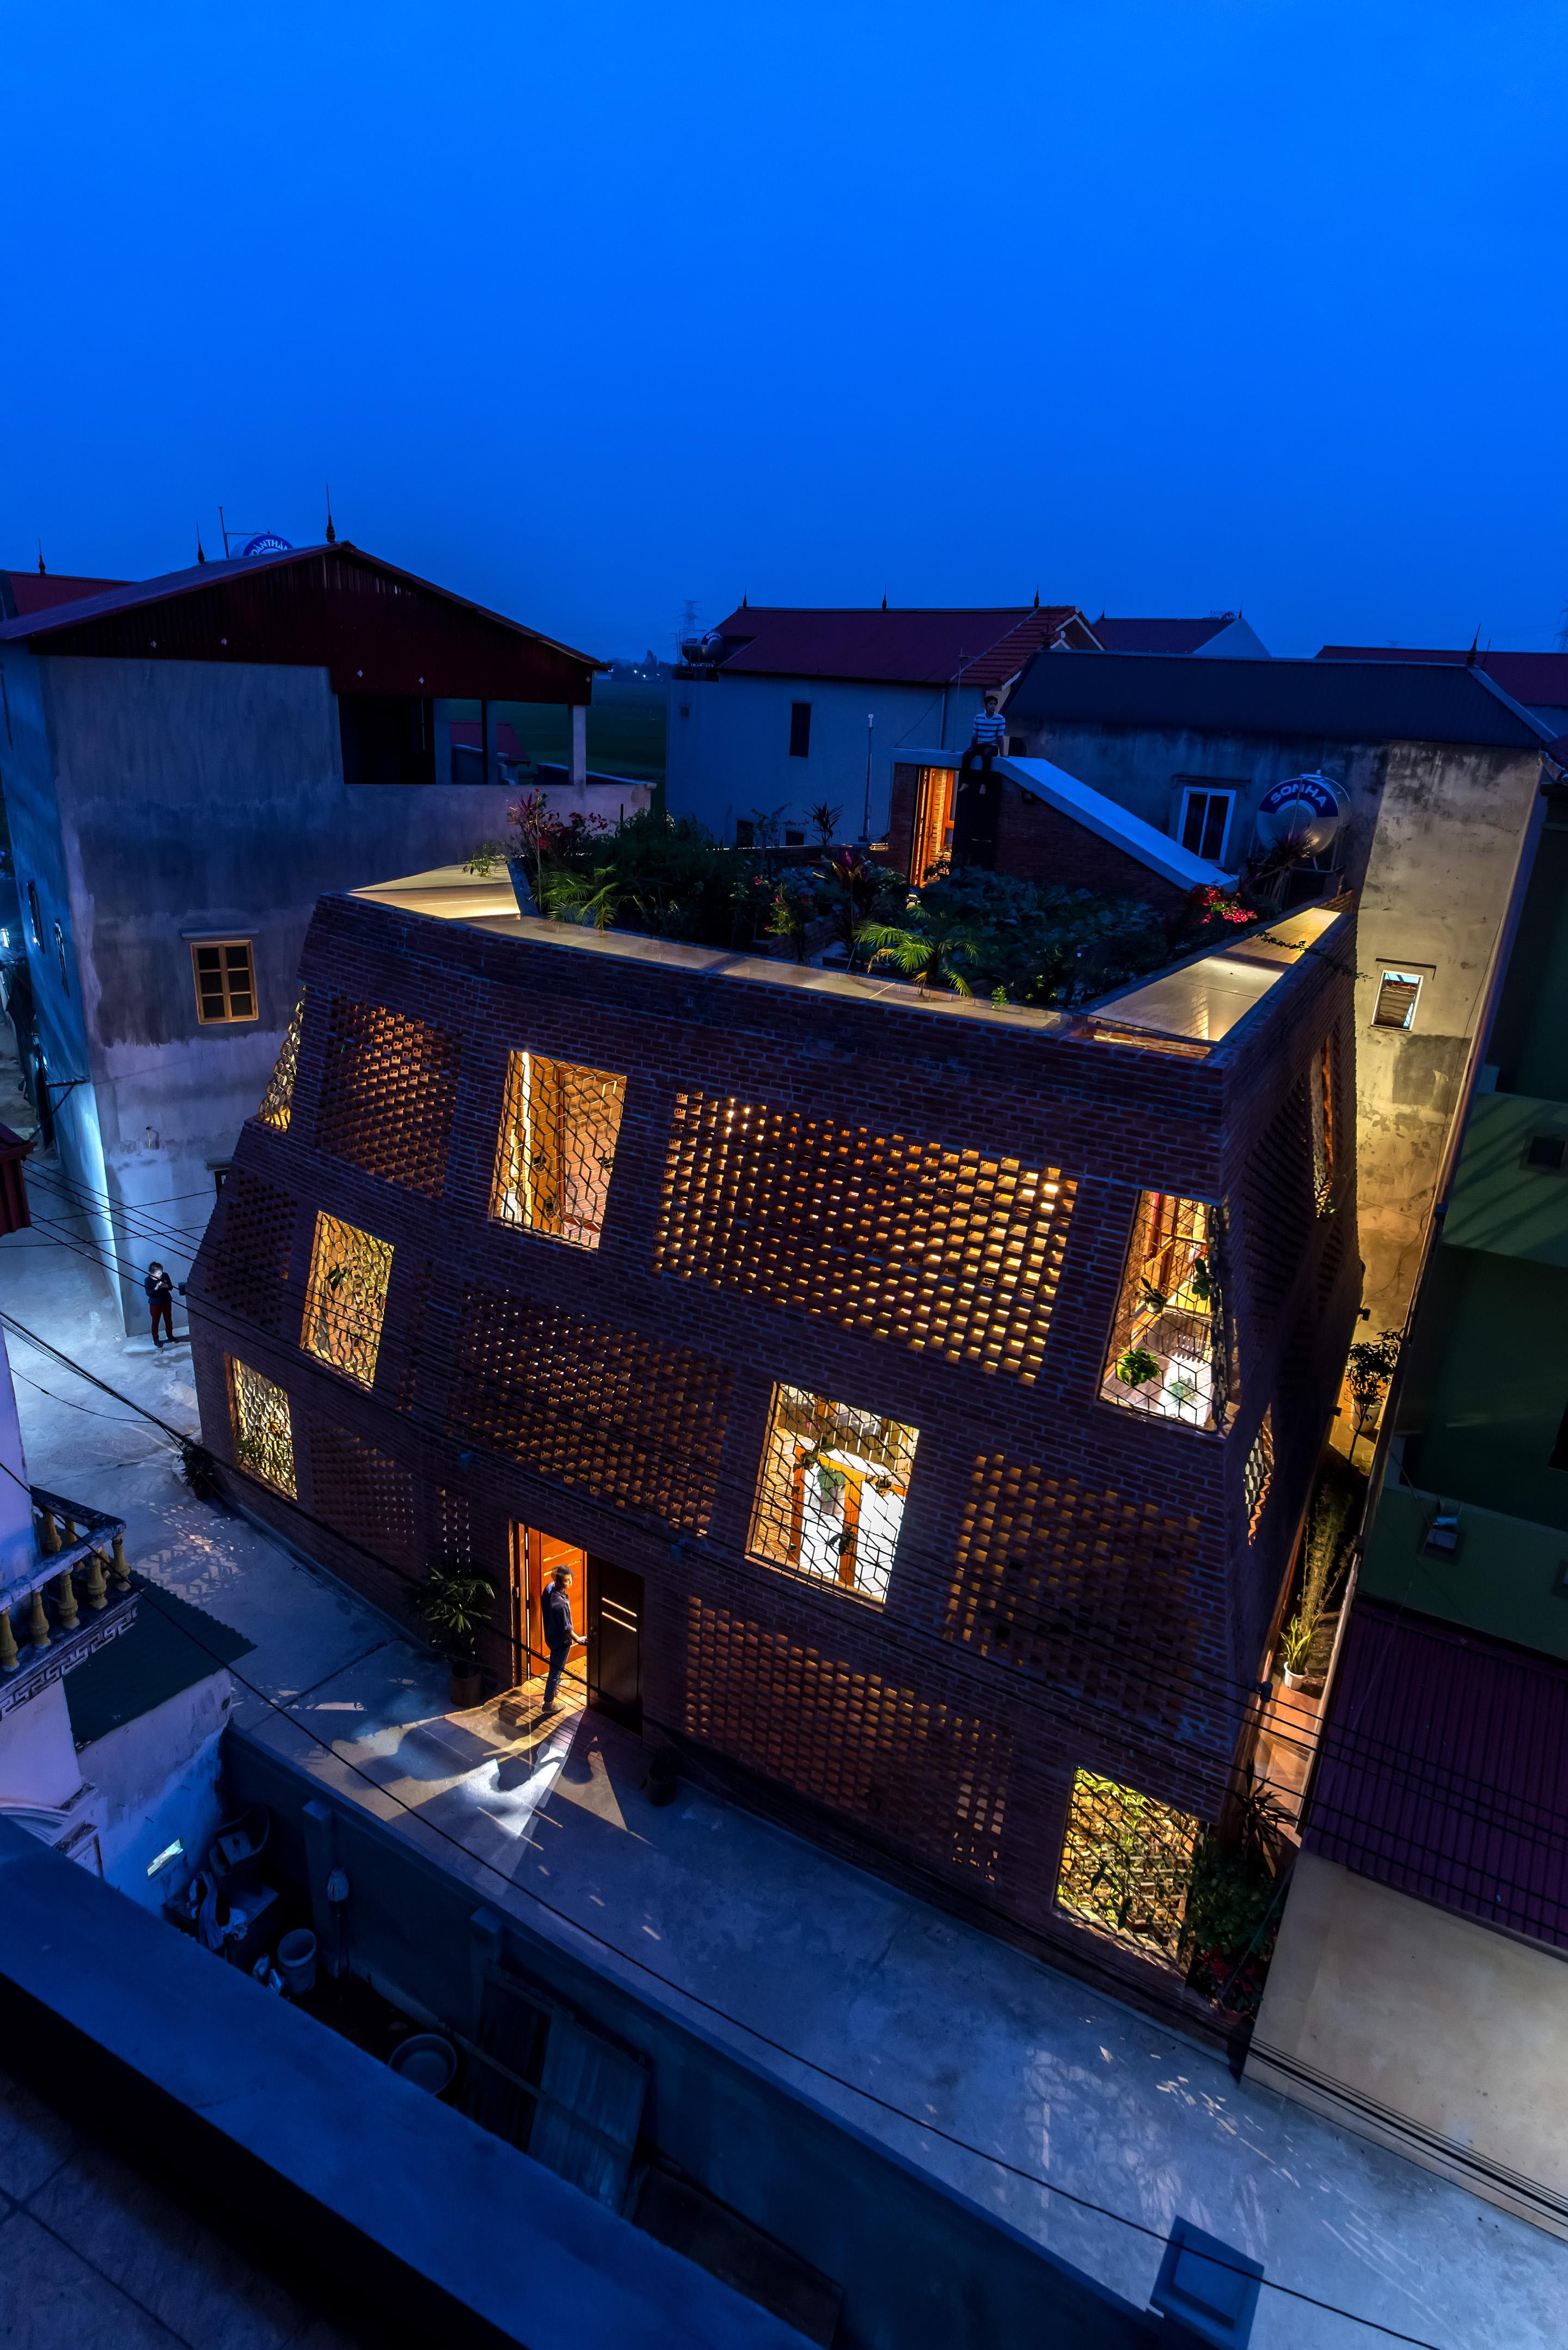 Casa de tijolos no Vietna.